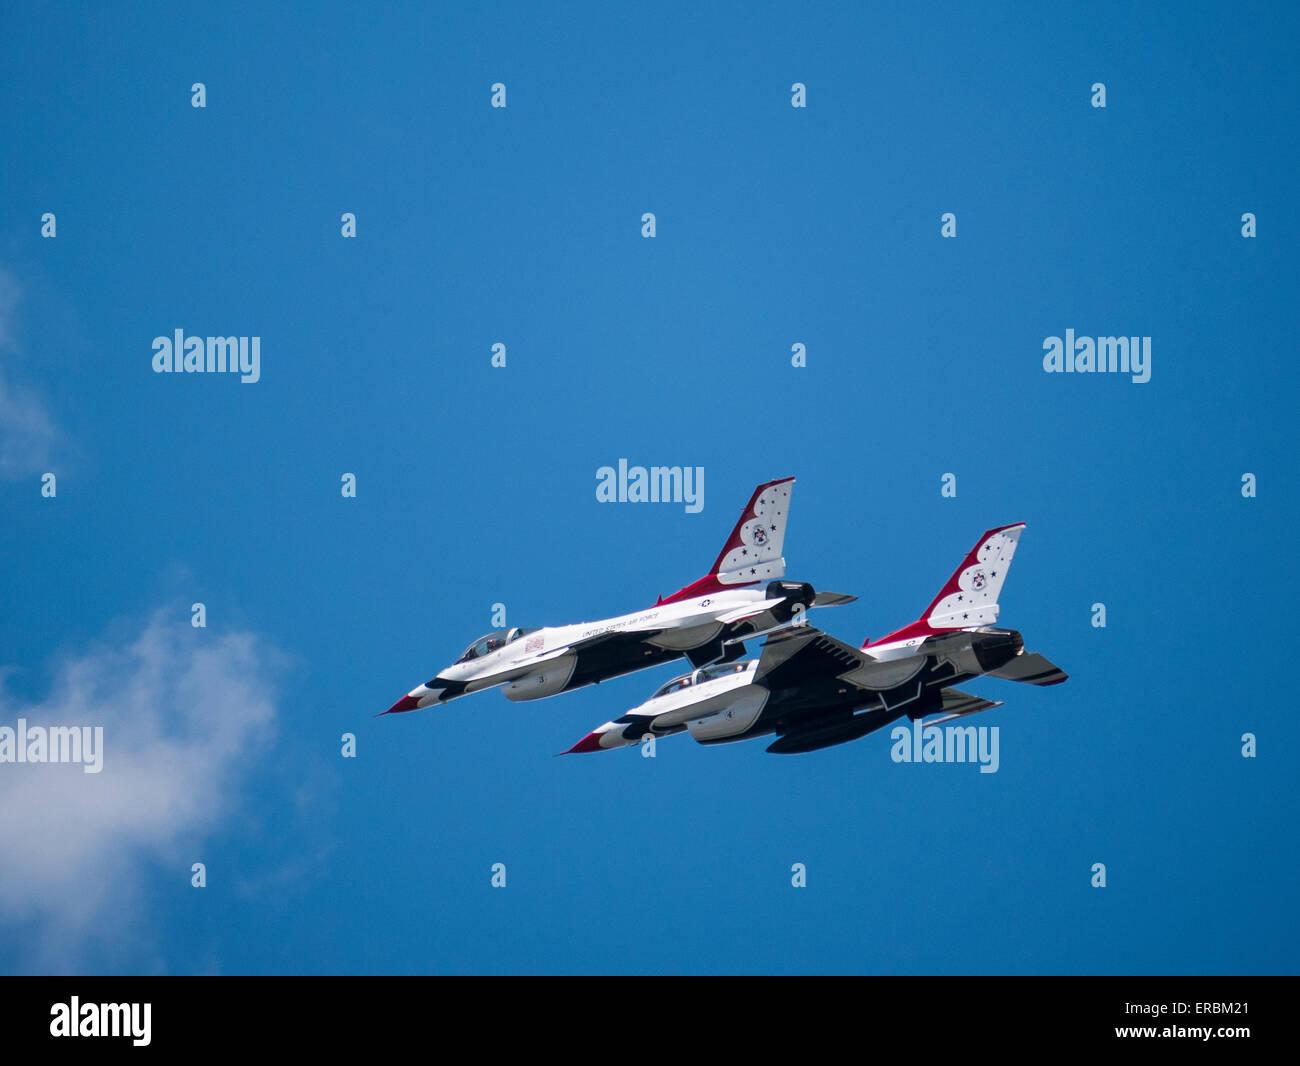 USAF Thunderbirds in flight, Rocky Mountain Air Show, Aurora Reservoir, Colorado. - Stock Image